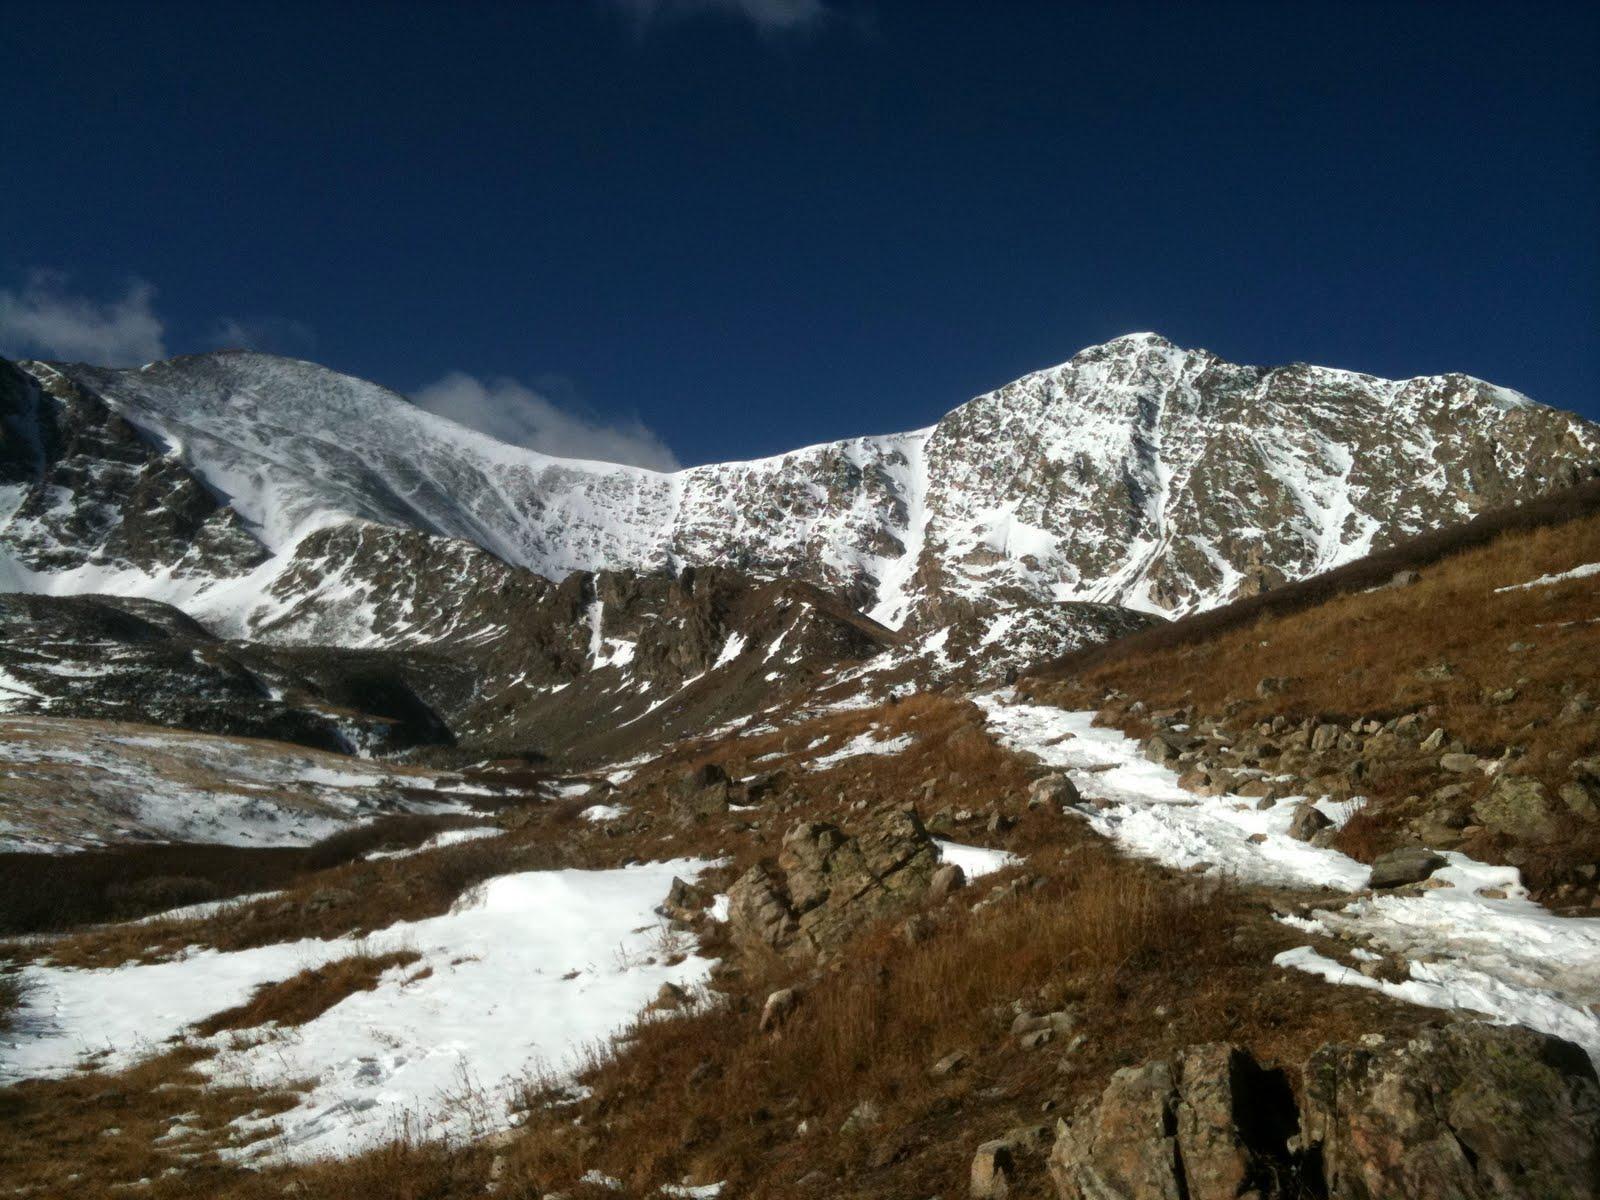 Torreys Peak Bob S World Travels